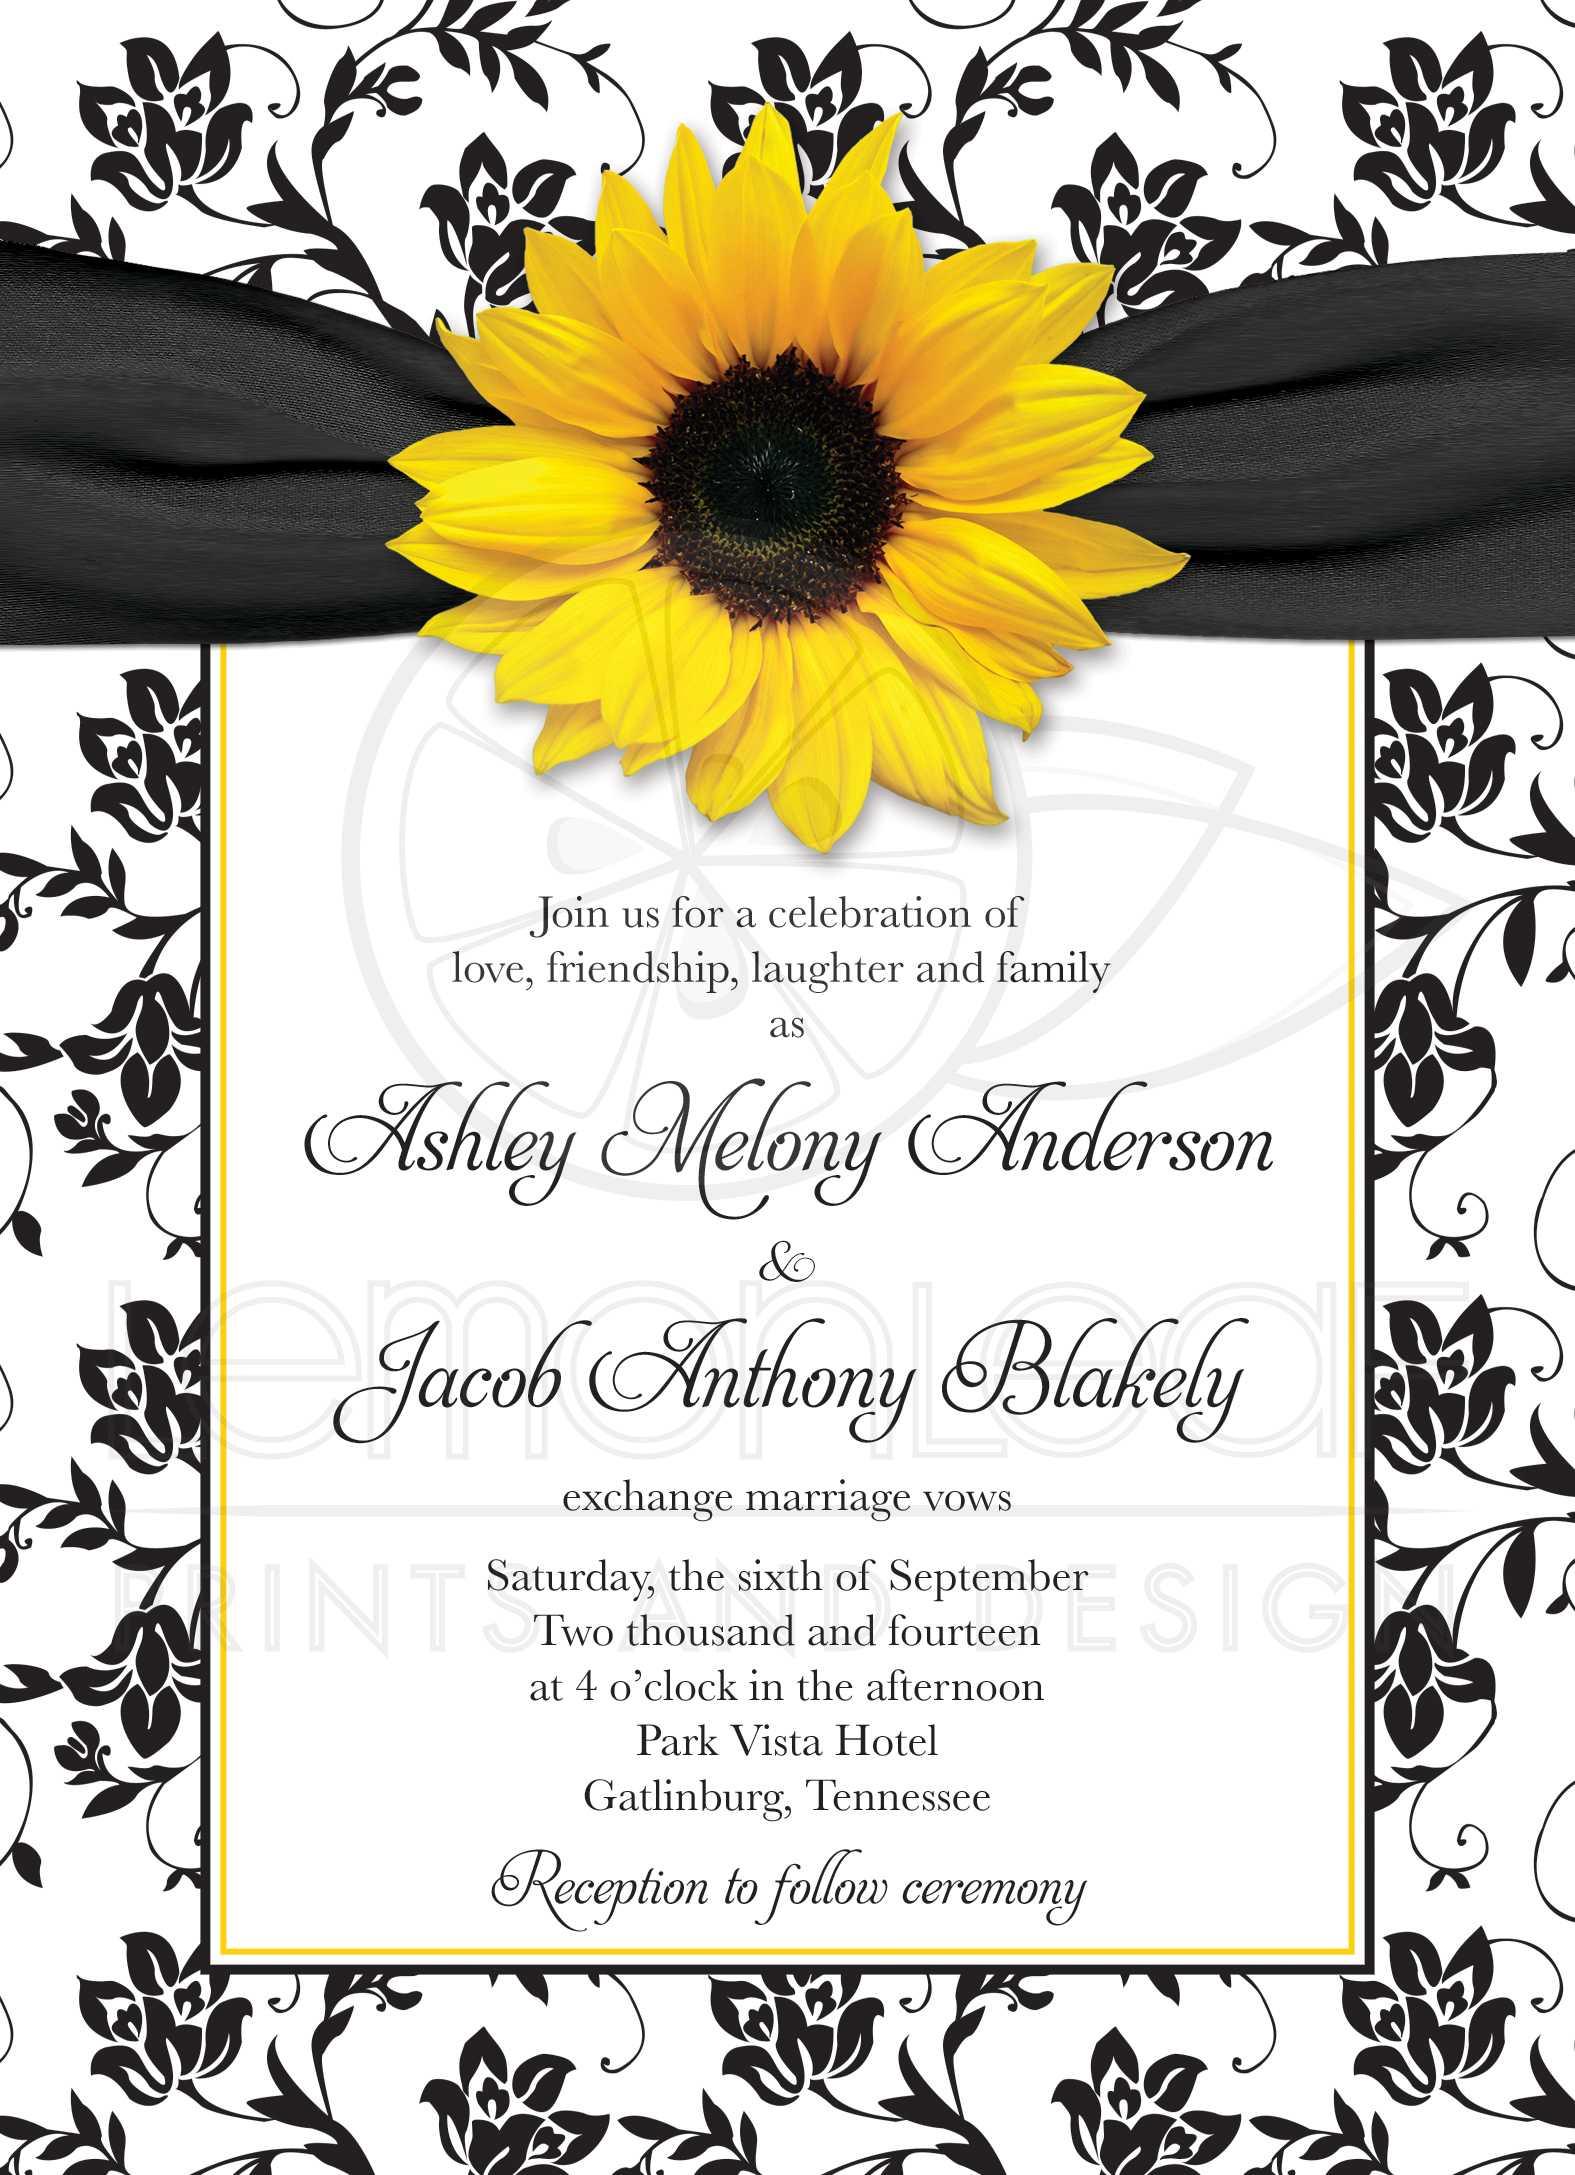 Wedding Invitation | Sunflower Damask Black White Yellow